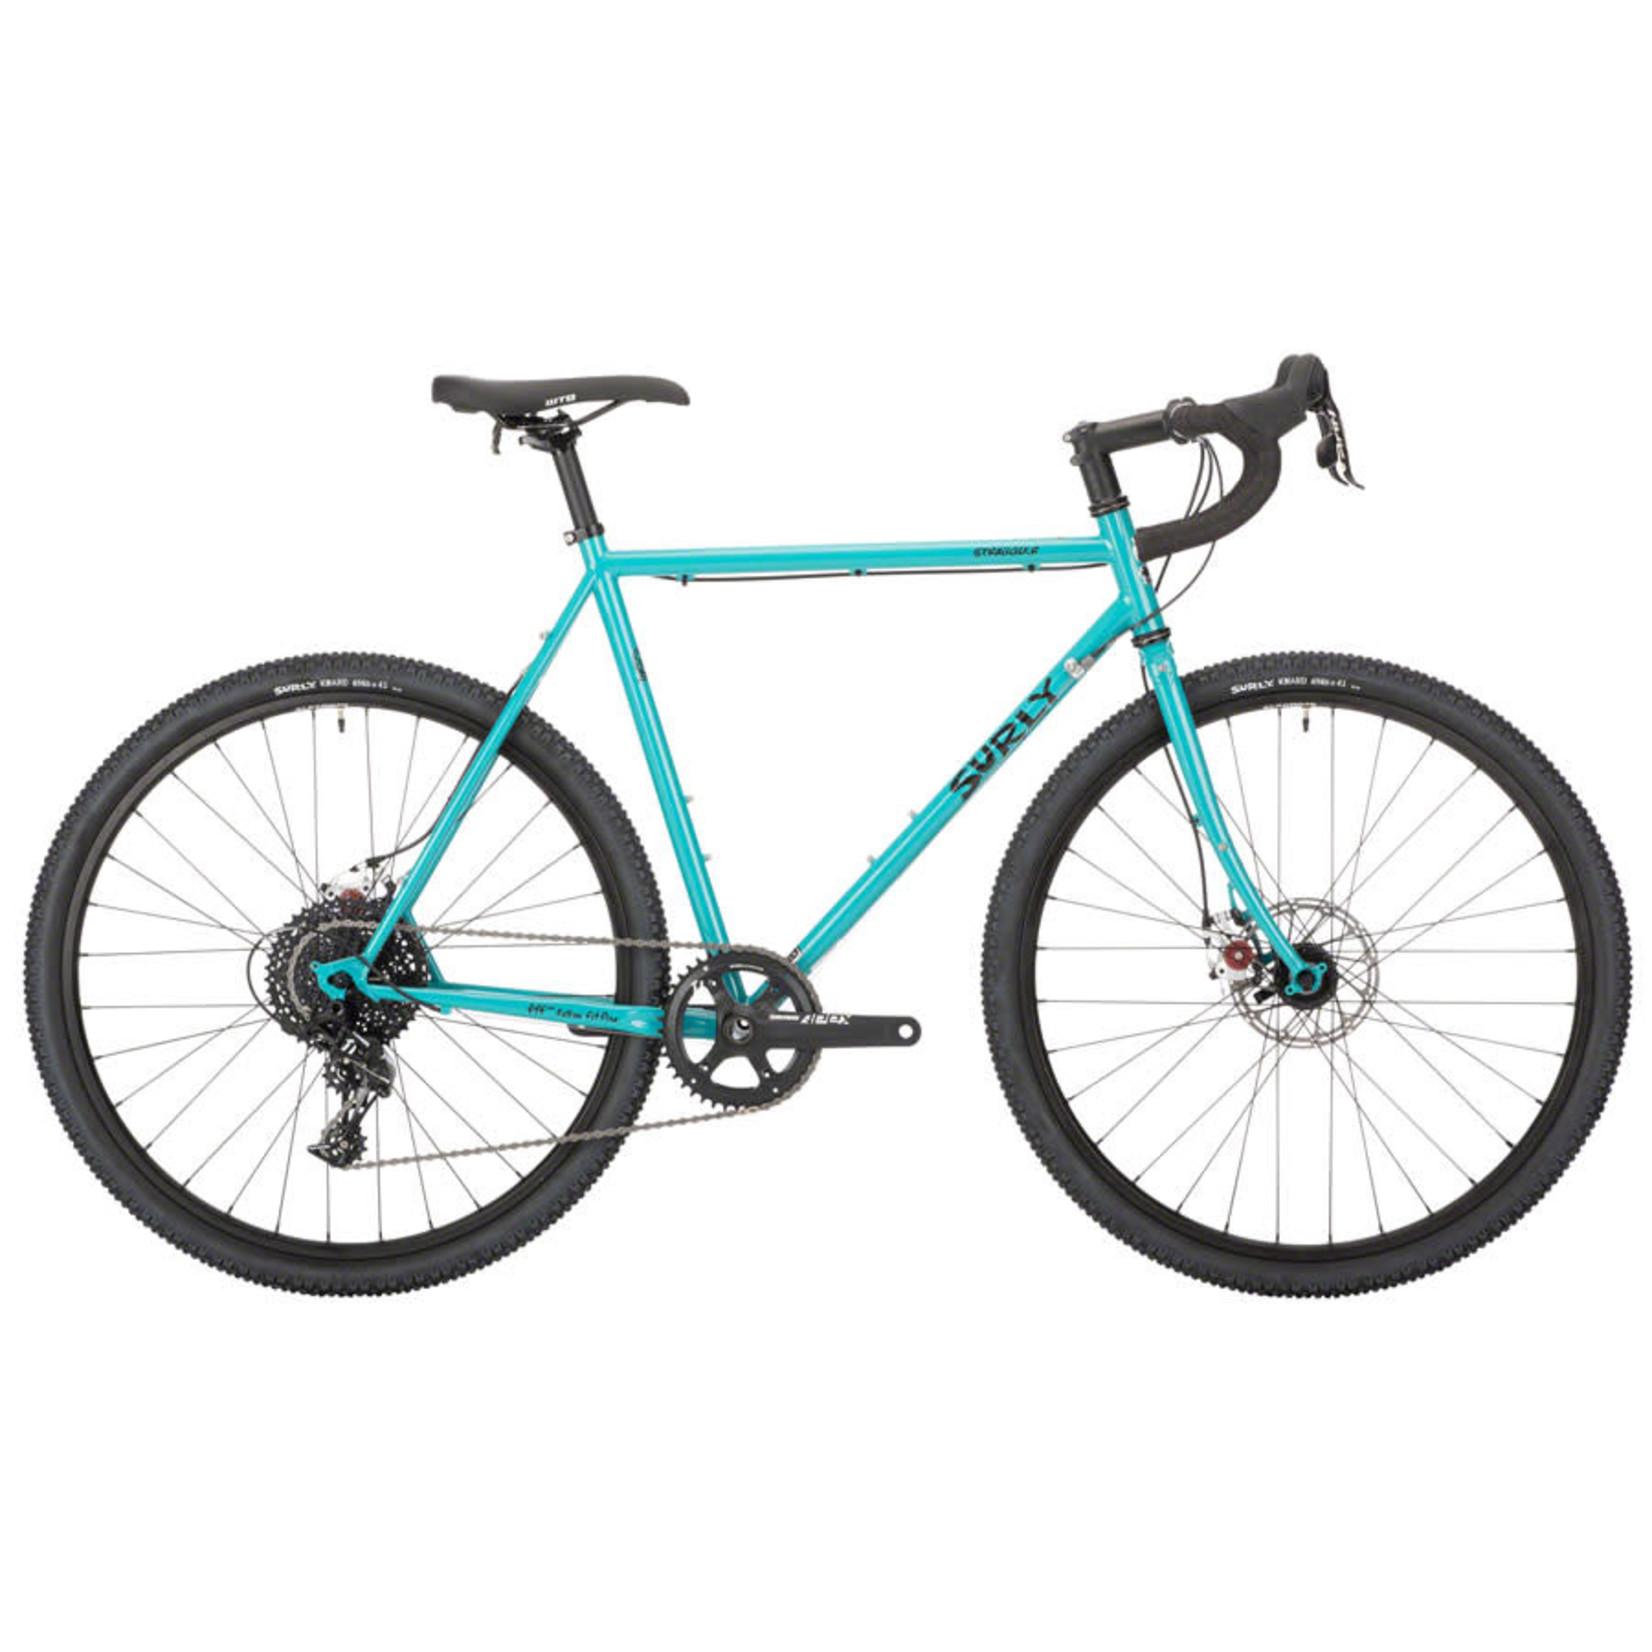 Surly Surly Straggler Bike - 650b, Steel, Chlorine Dream, 42cm